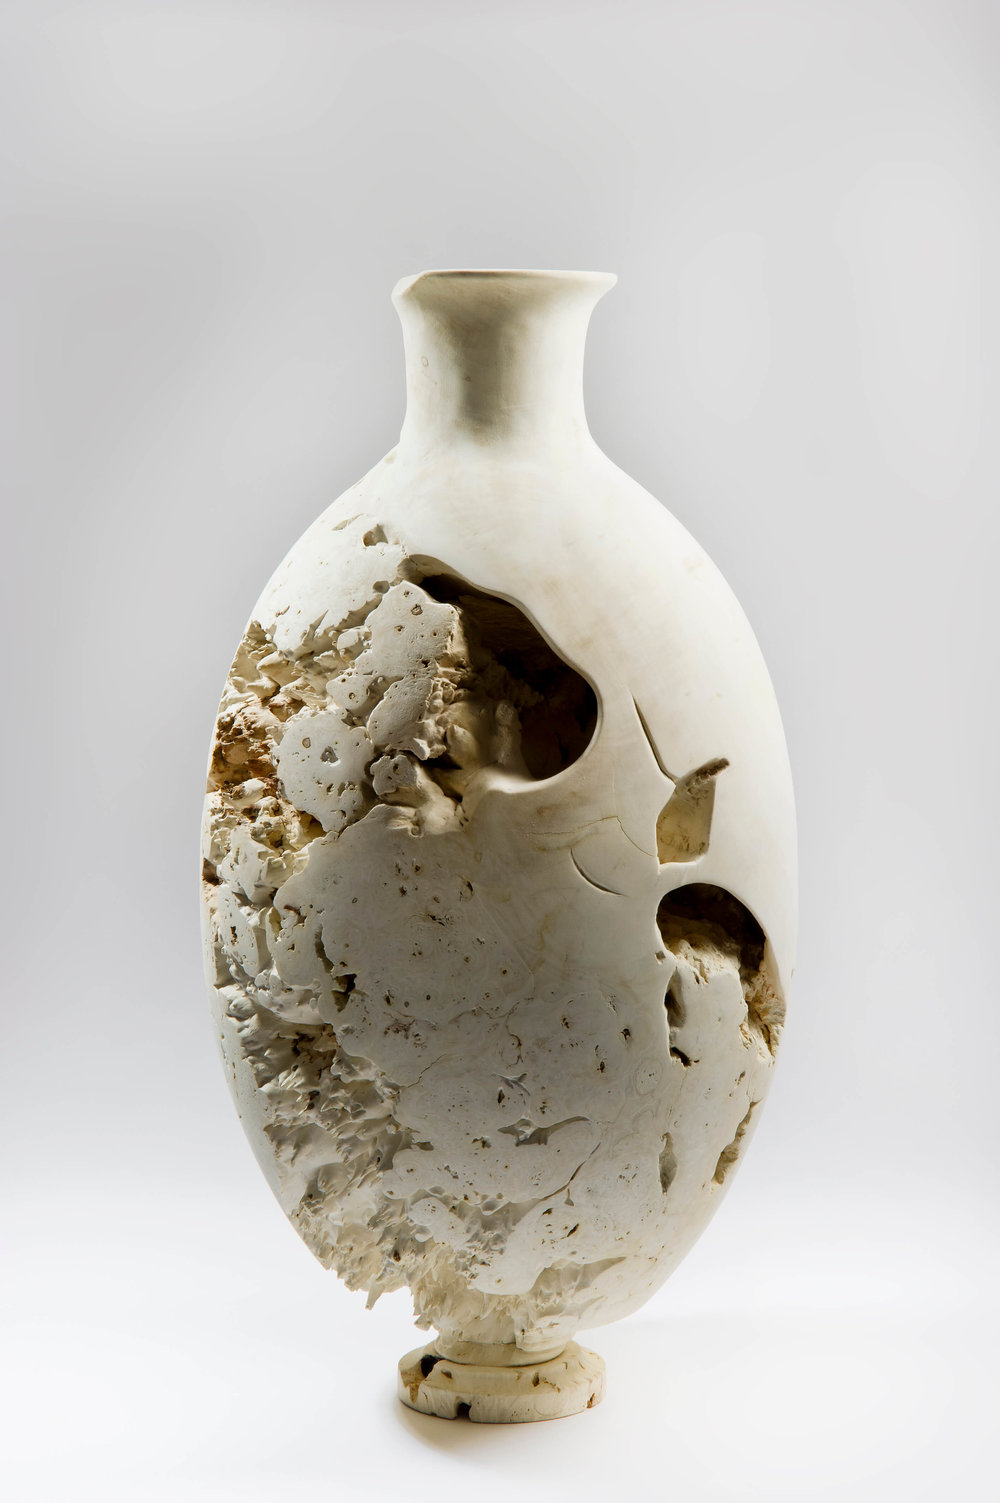 Echoes of Amphora: V/18, 2018